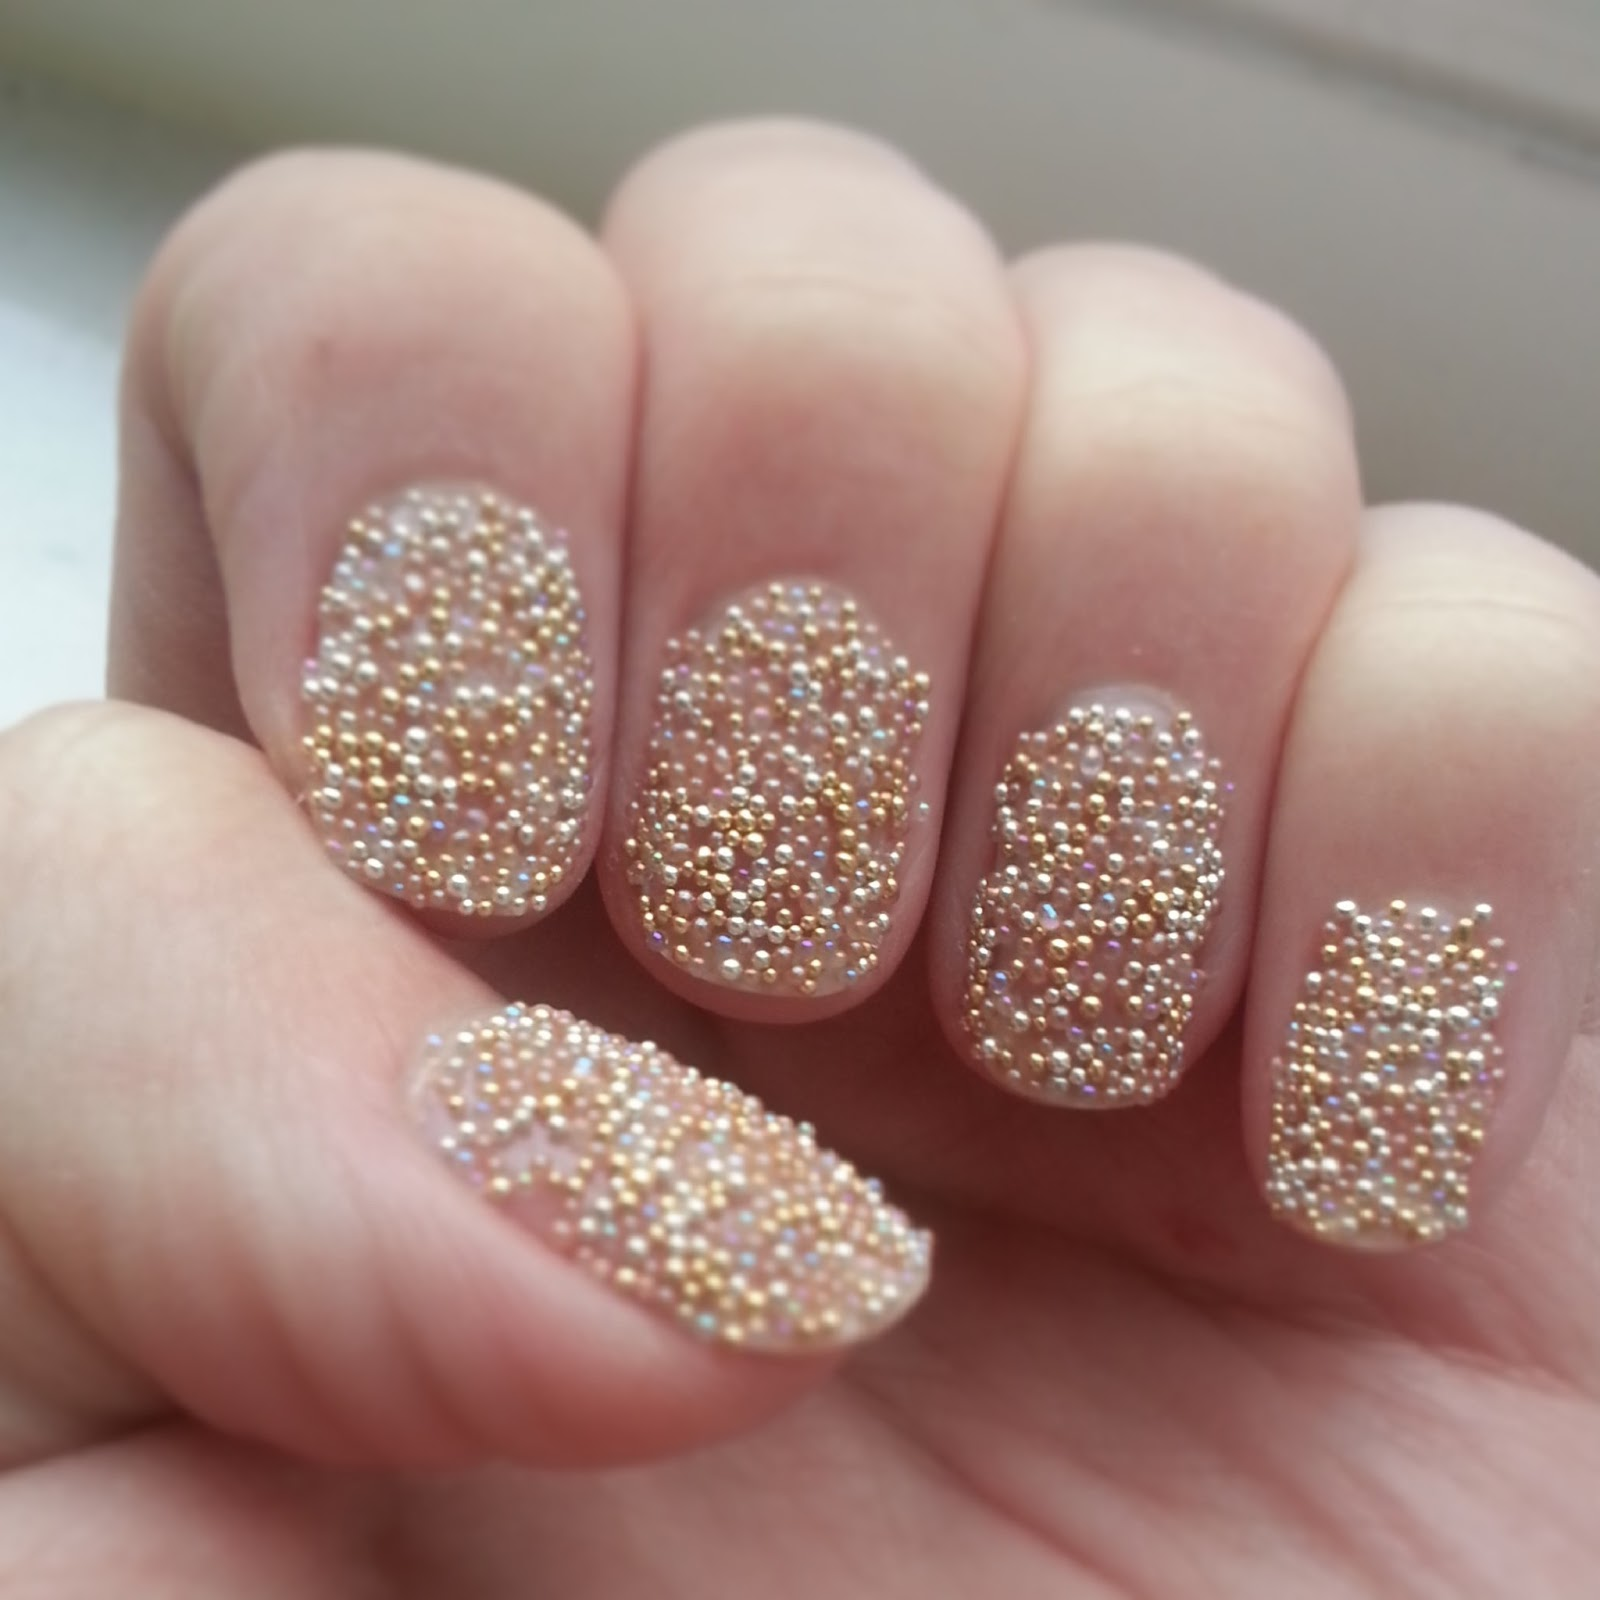 Ciate Bead Nails: Ciate Caviar Nails!